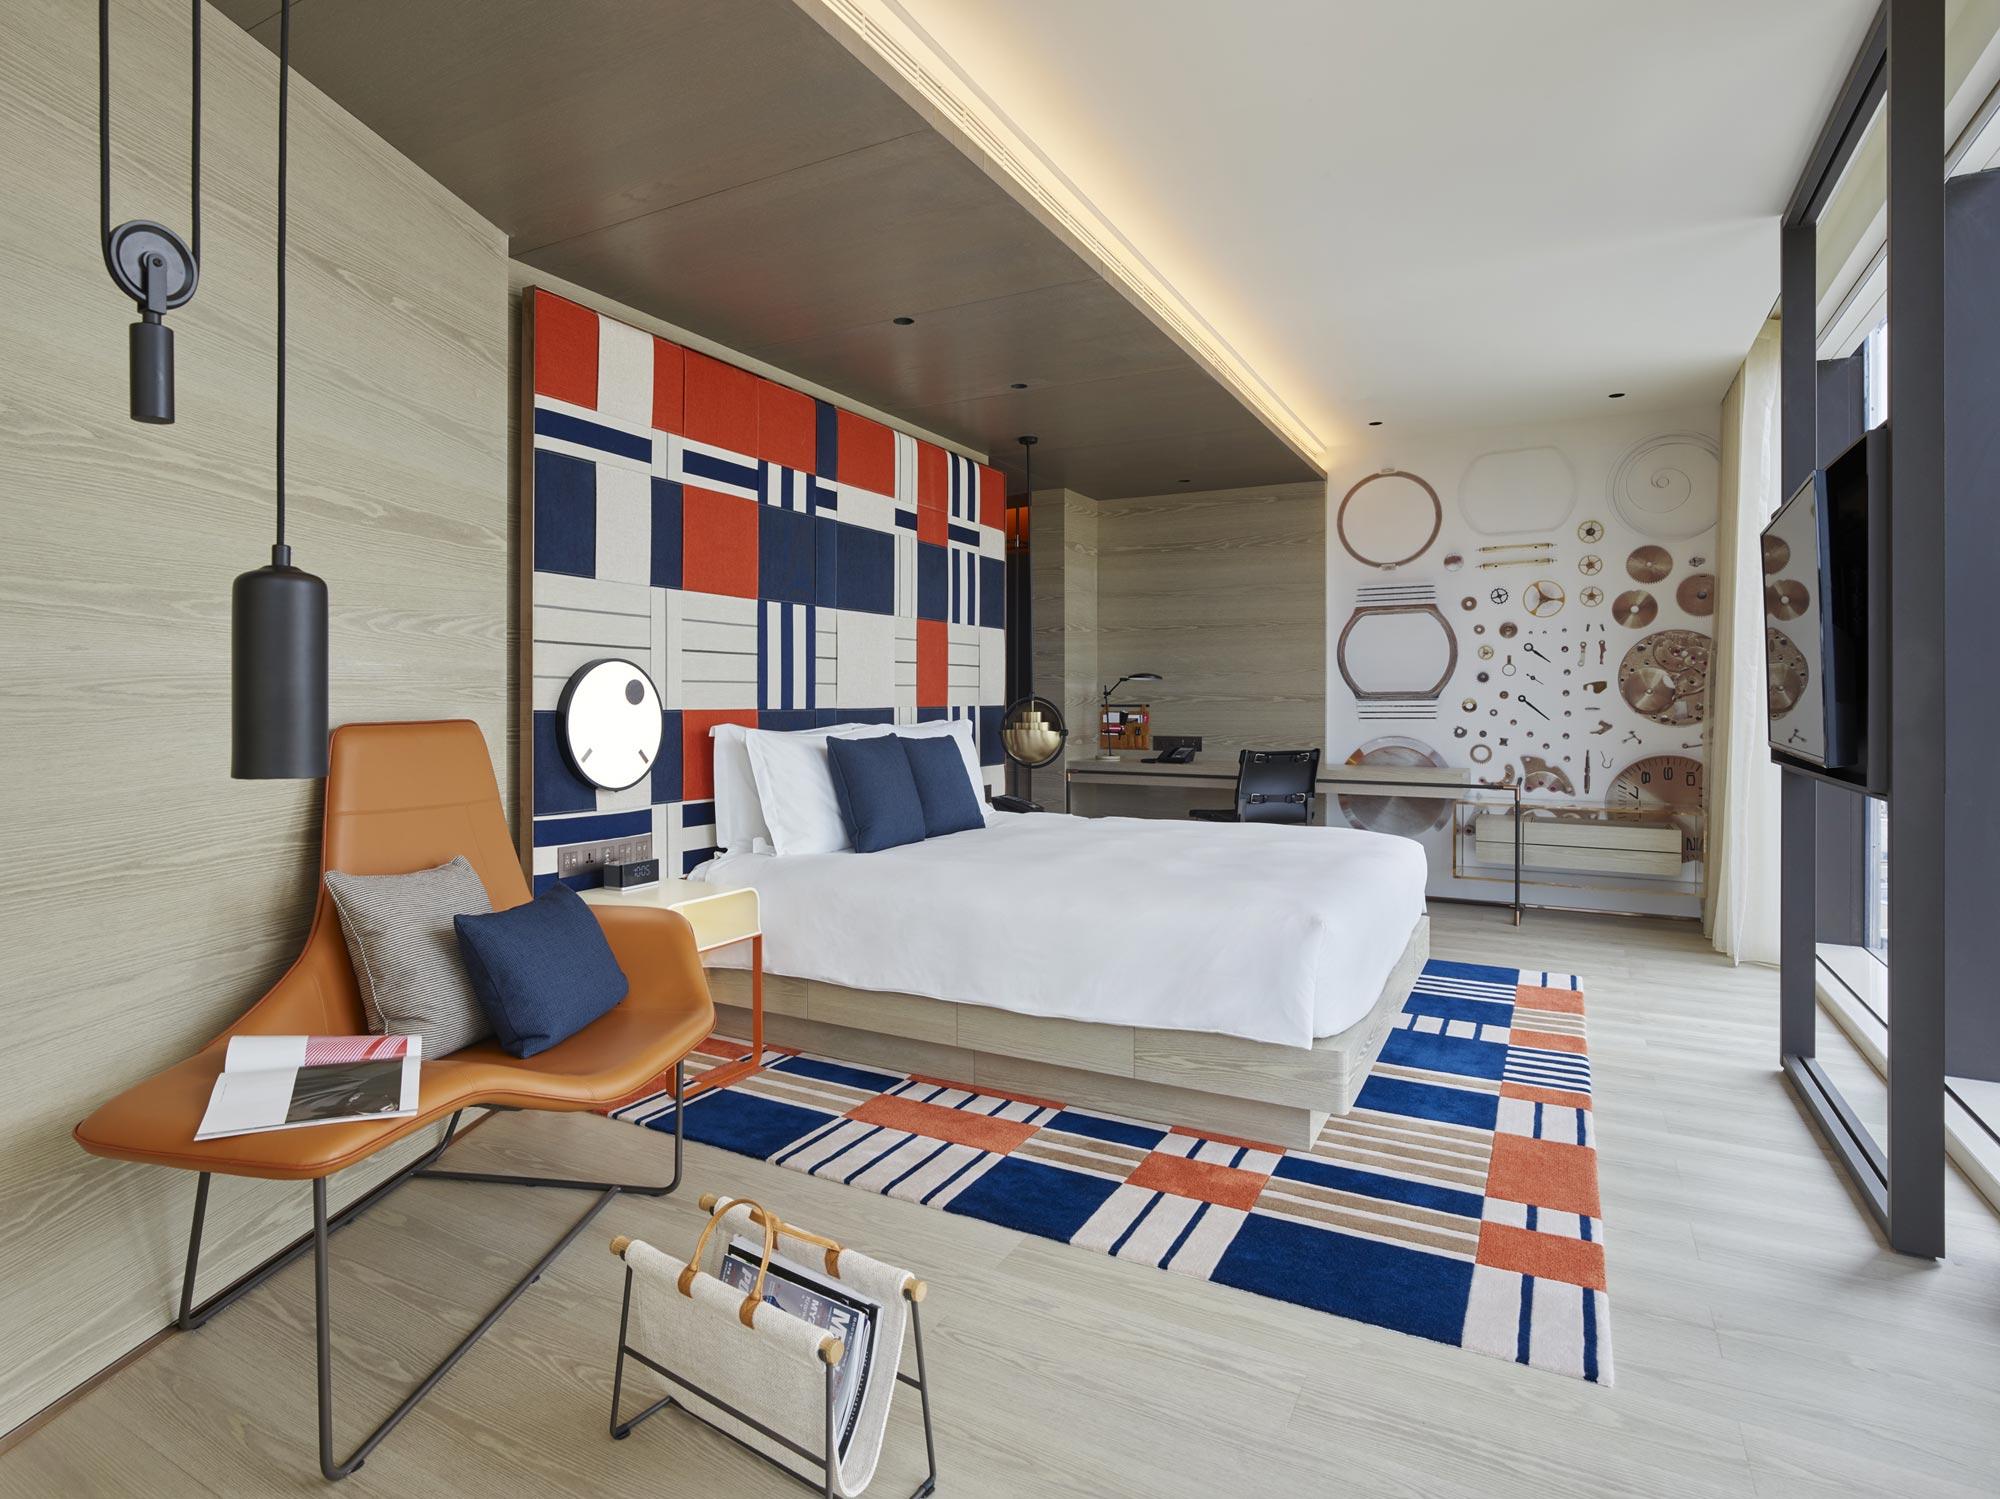 Hirsch Bedner Associates hotel design project images for SBID interior design blog, Project of the Week